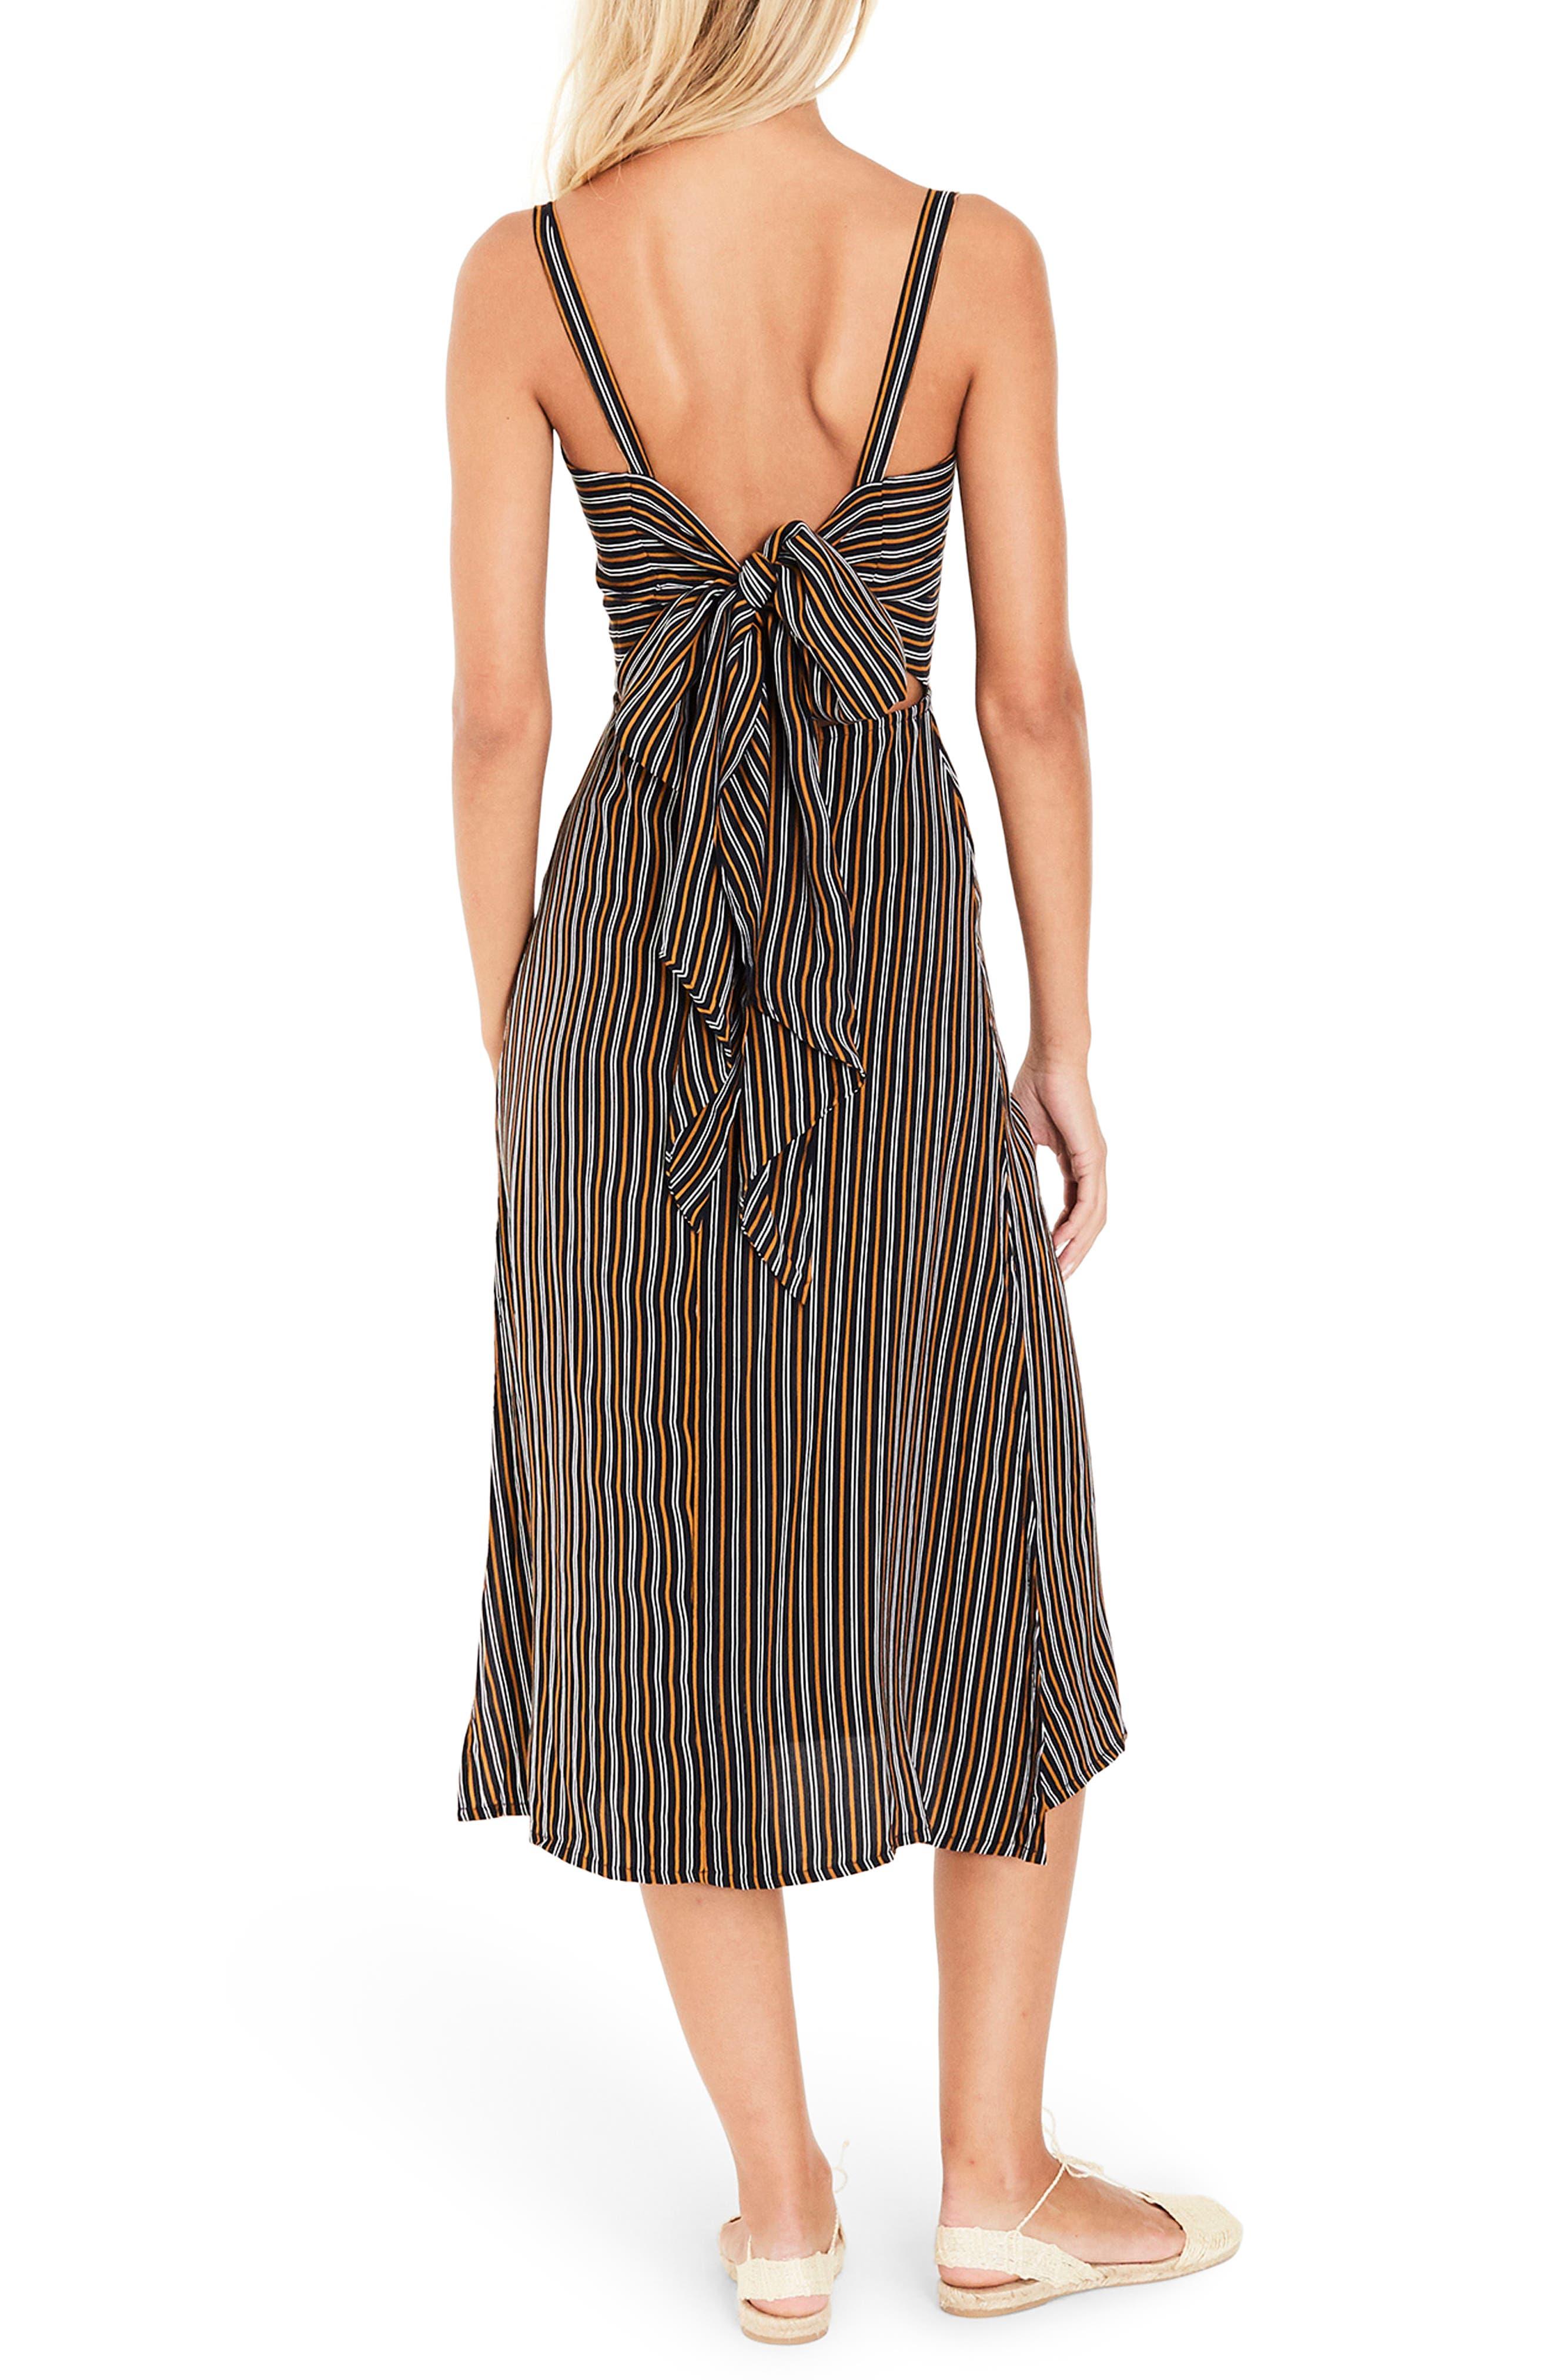 Katergo Stripe Tie Back Midi Dress,                             Alternate thumbnail 2, color,                             GLASGOW STRIPE PRINT